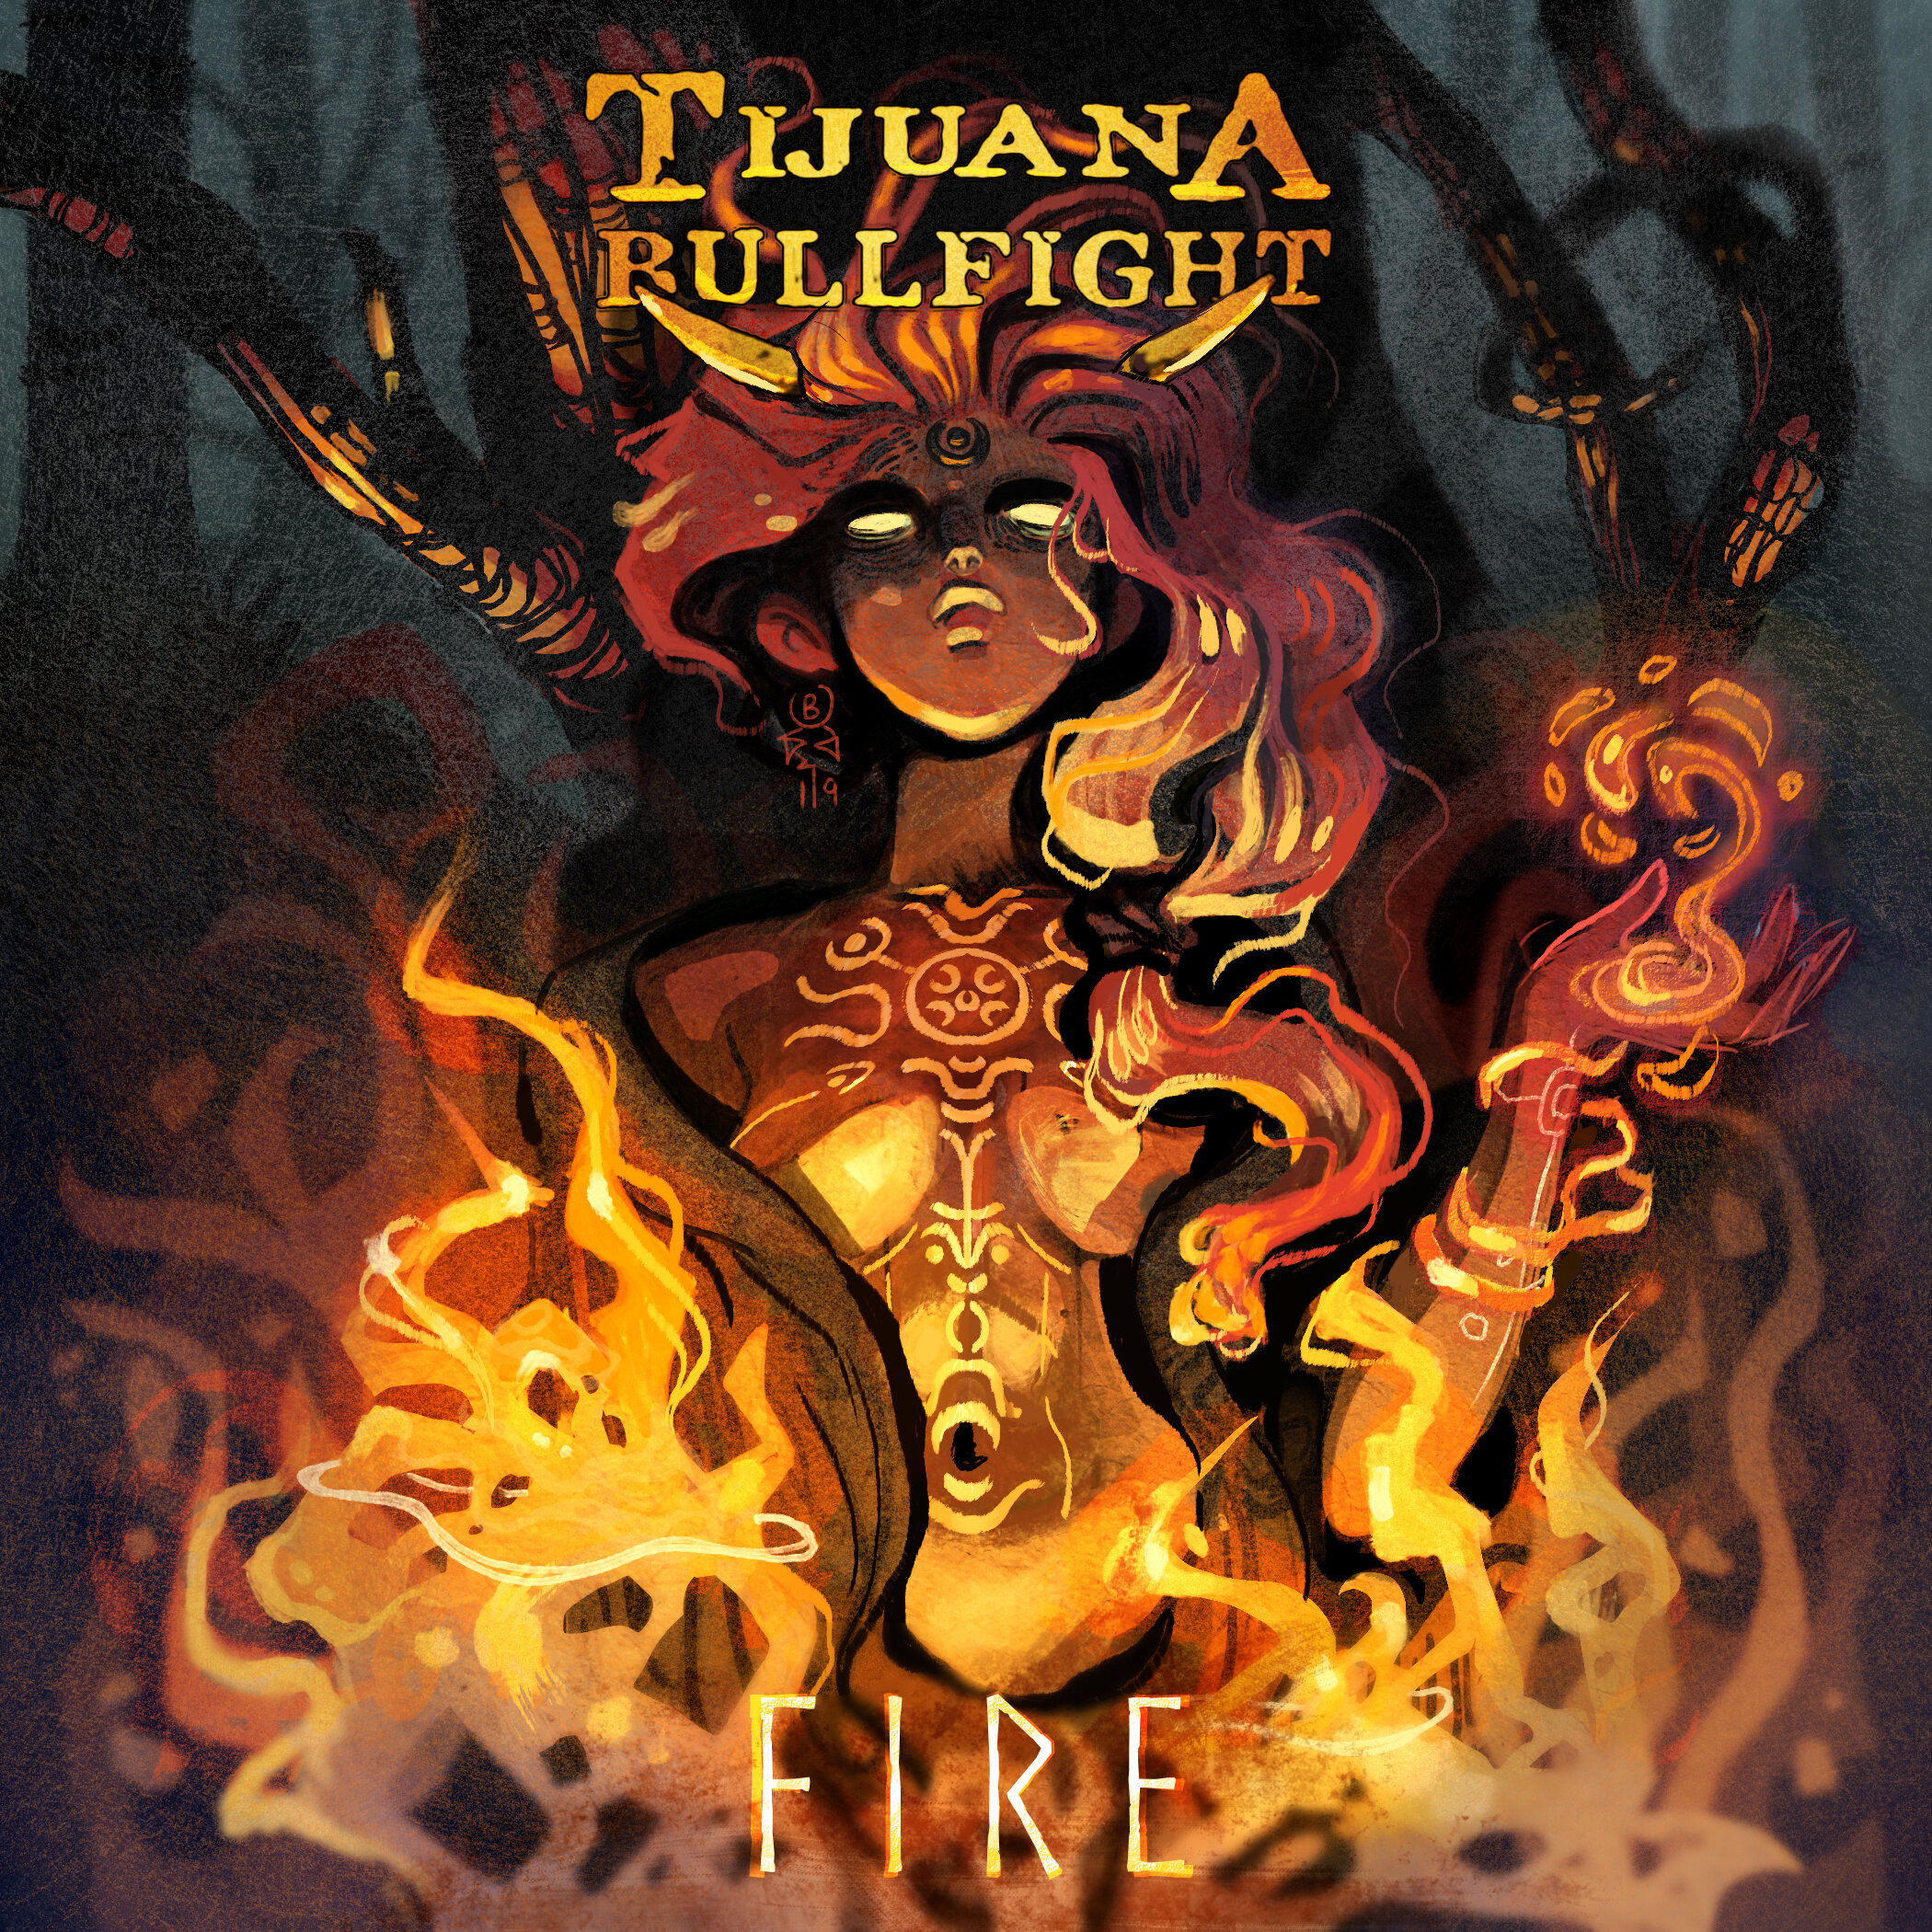 FIRE |  cover art for LA band Tijuana Bullfight